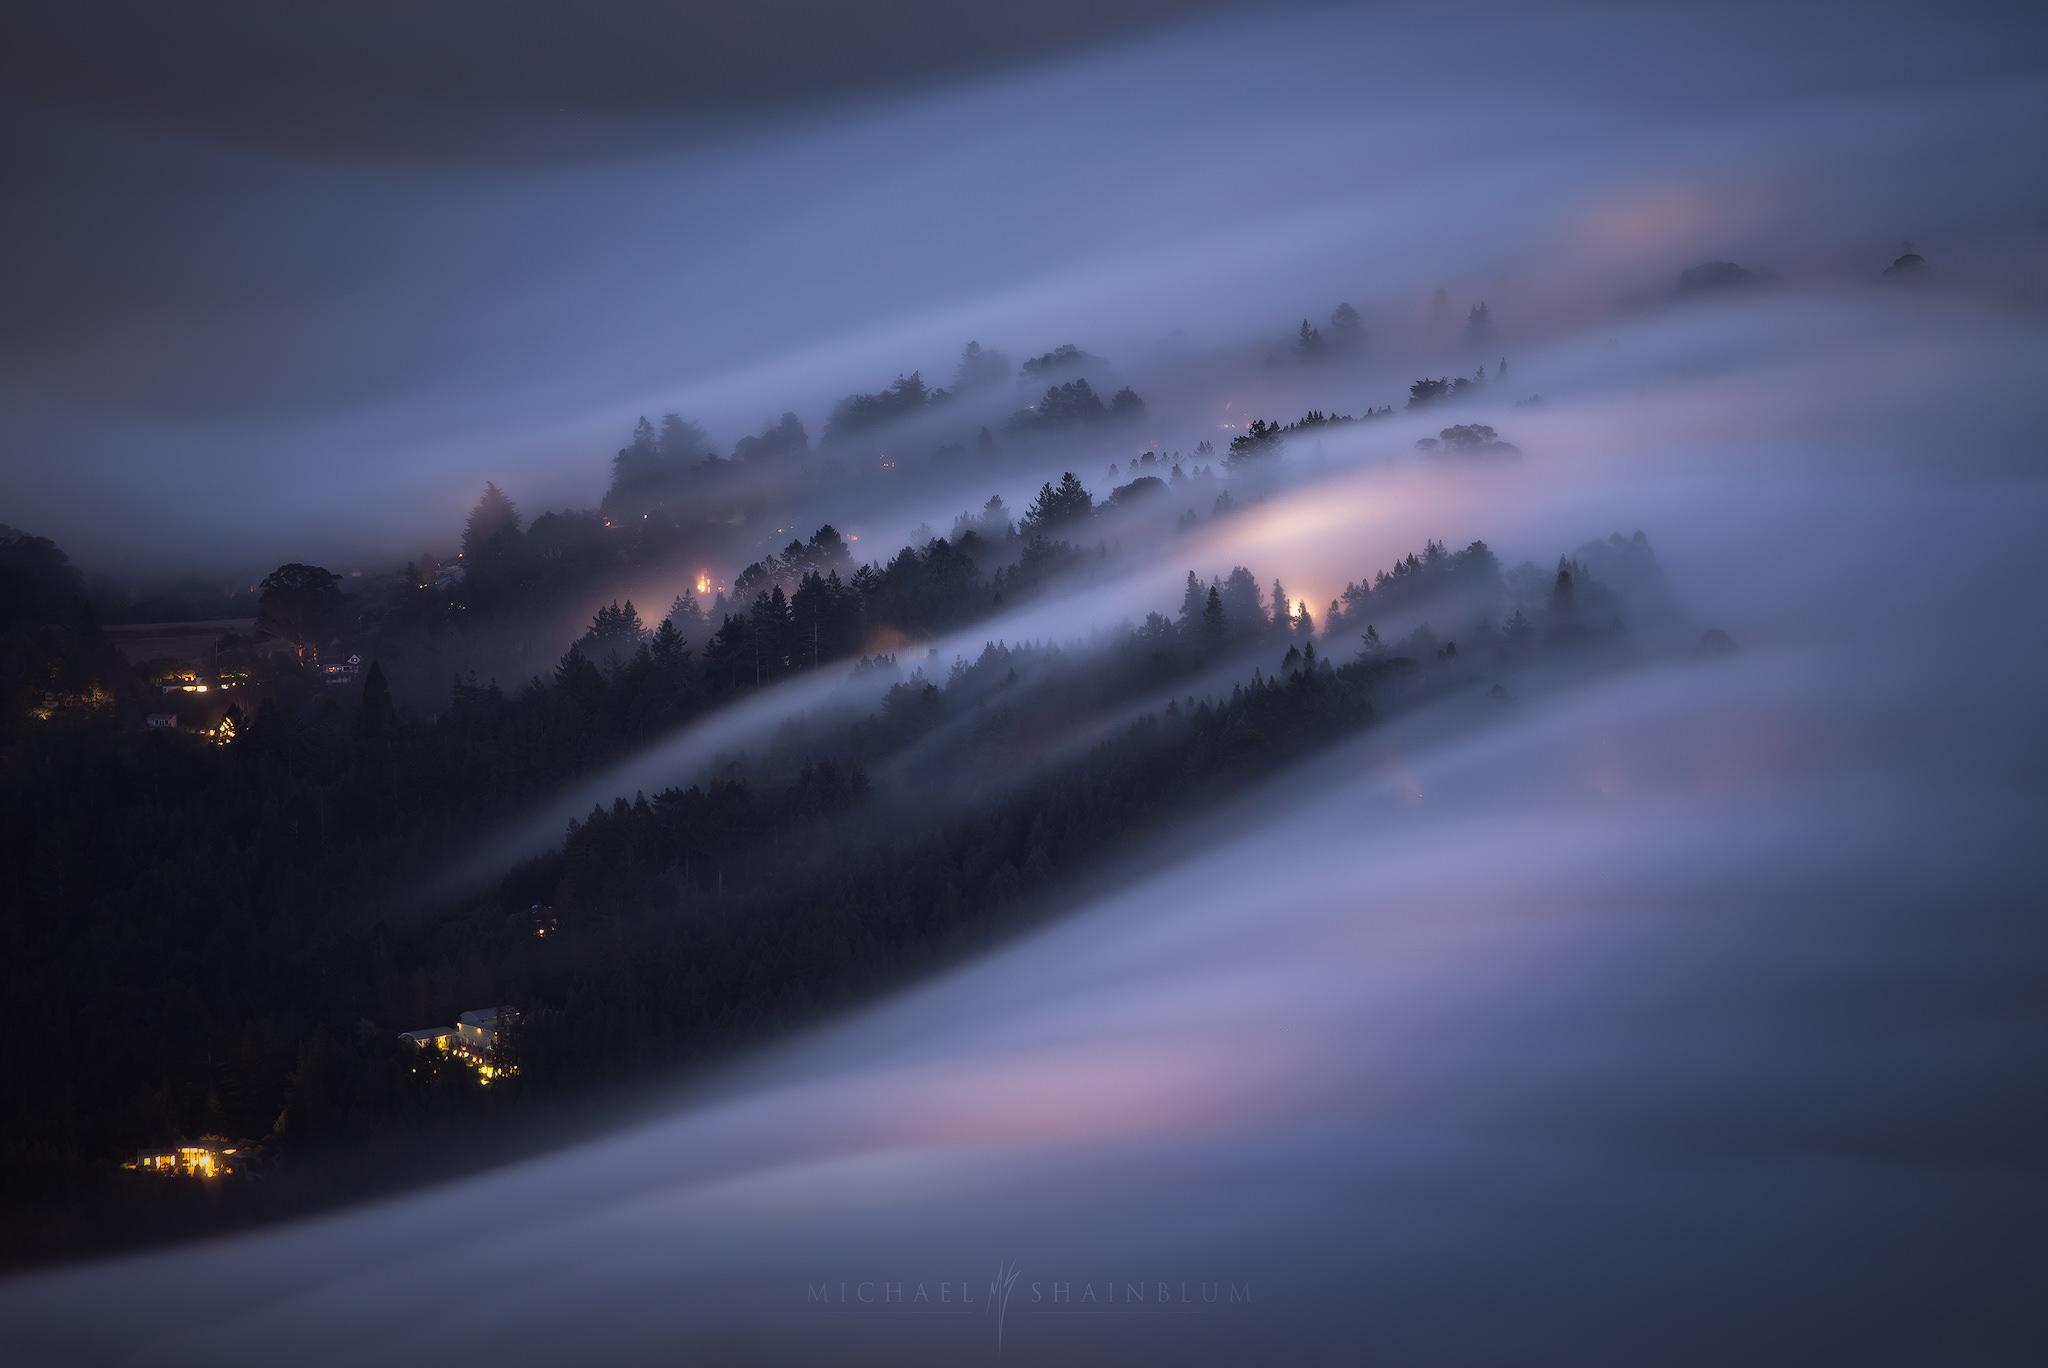 san francisco shrouded in dense fog captured by michael